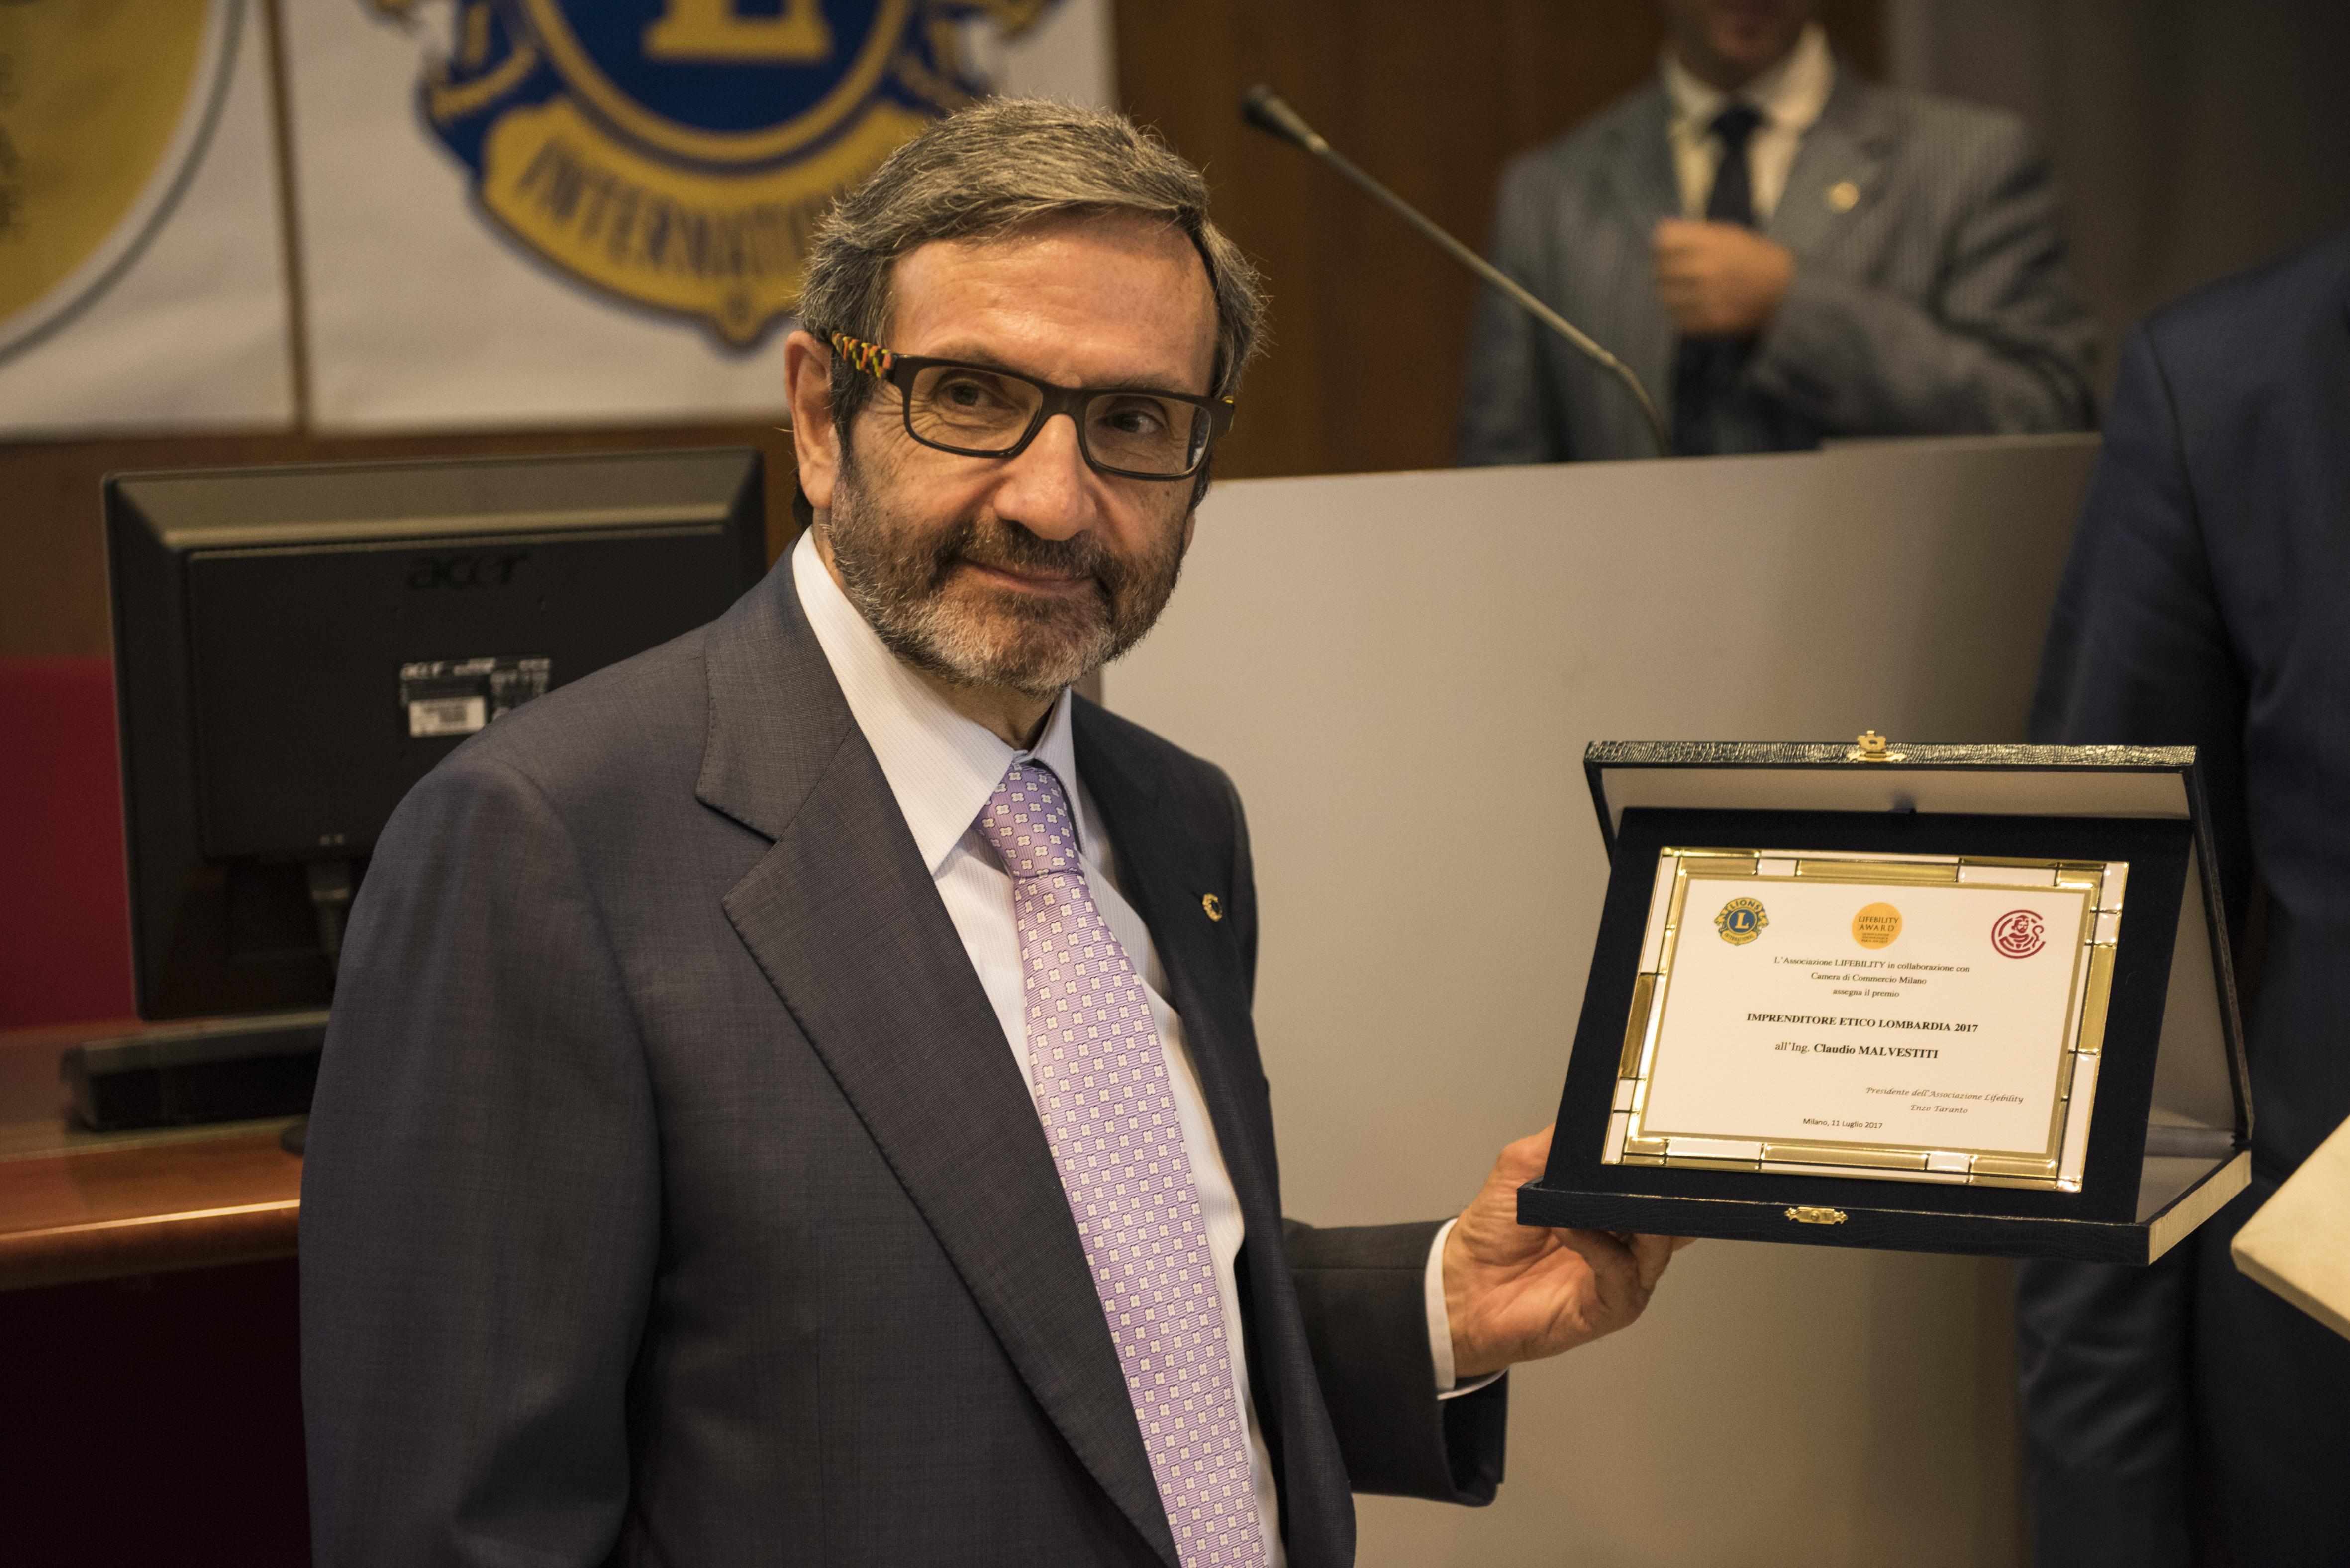 Claudio Malvestiti – Vincitore Premio Imprenditore Etico Lombardia 2017